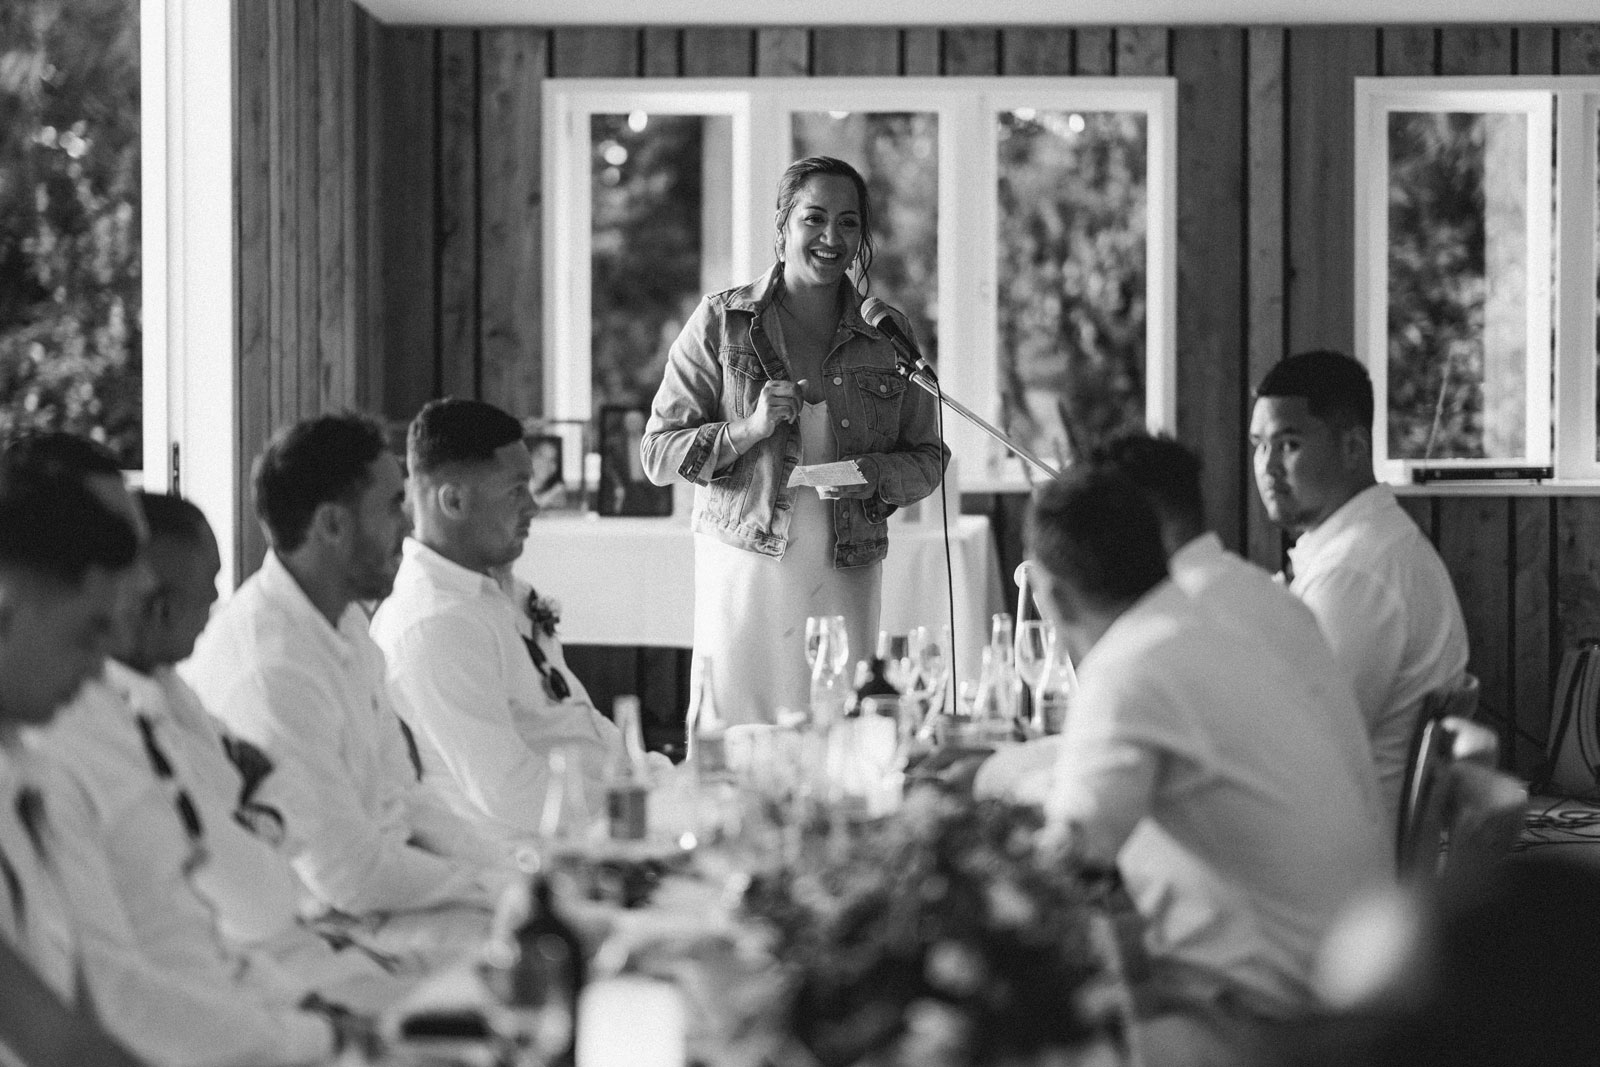 newfound-n-w-black-barn-tarawera-rotorua-wedding-photographer-945A